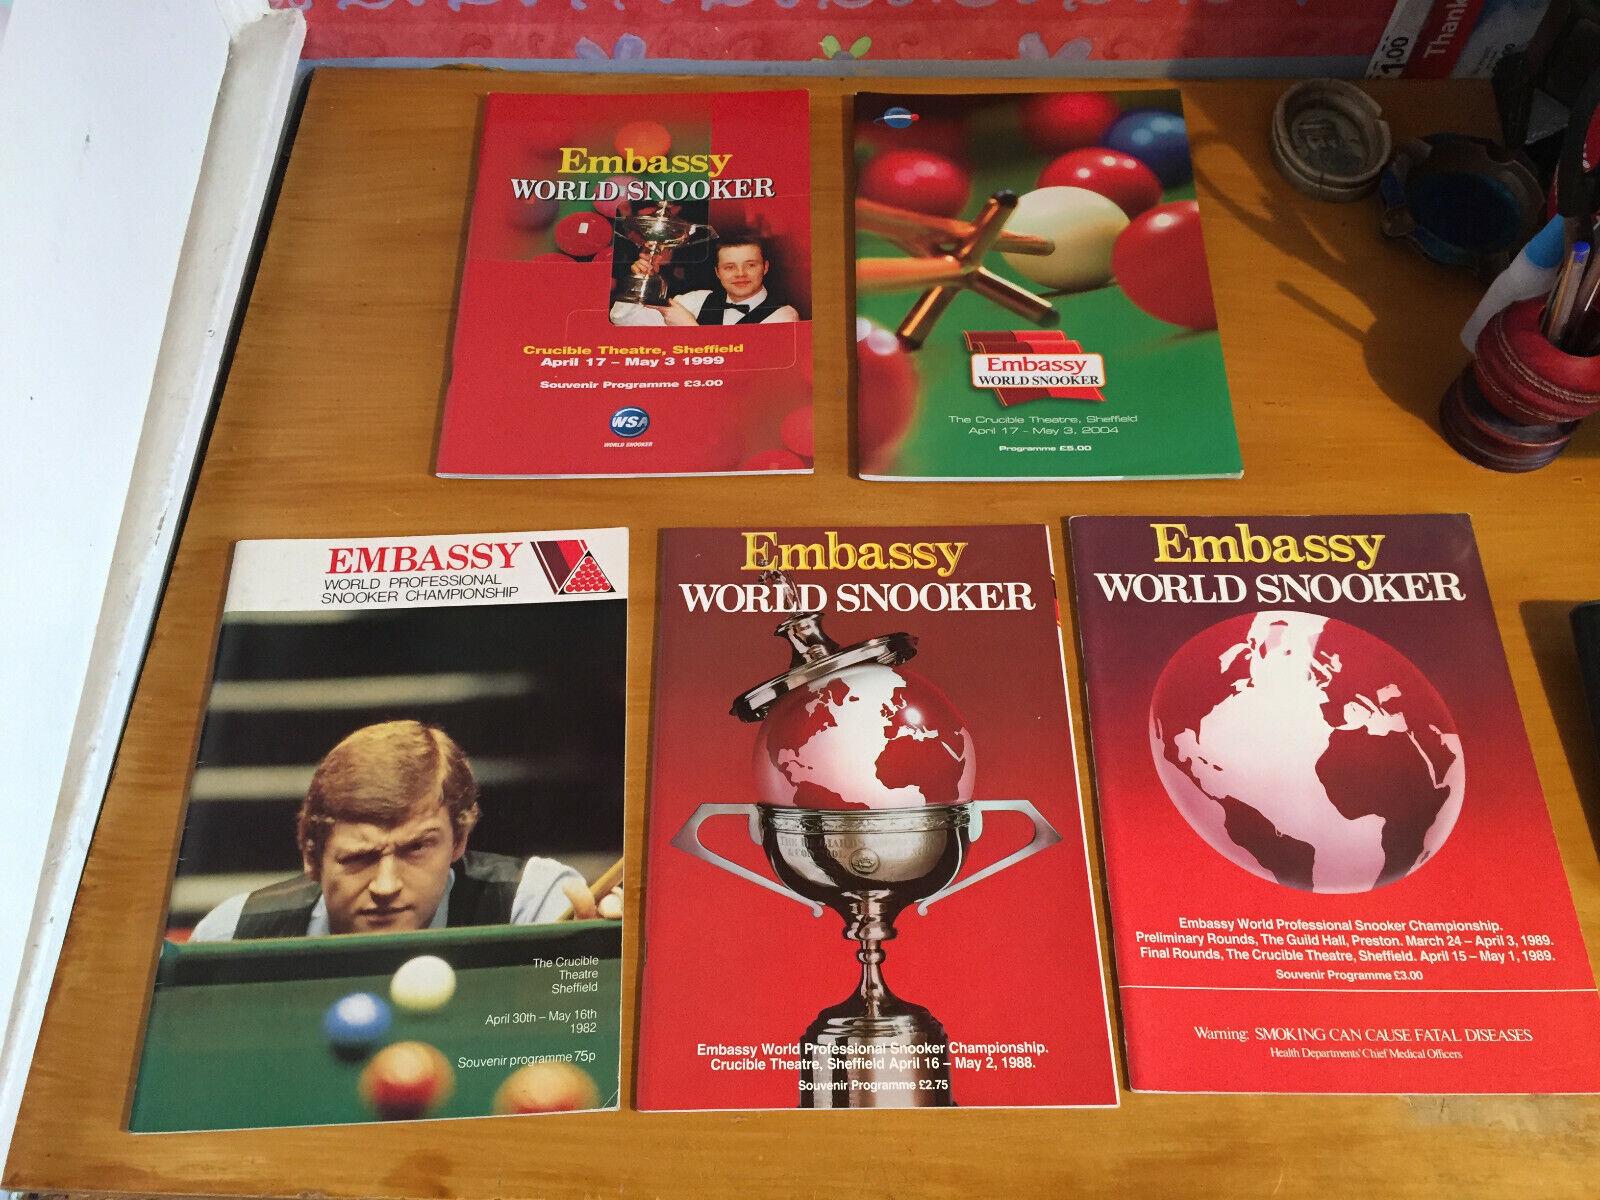 1980s-2004 5 Embassy World Professional Snooker Championship Progs 1982/8/9/1999